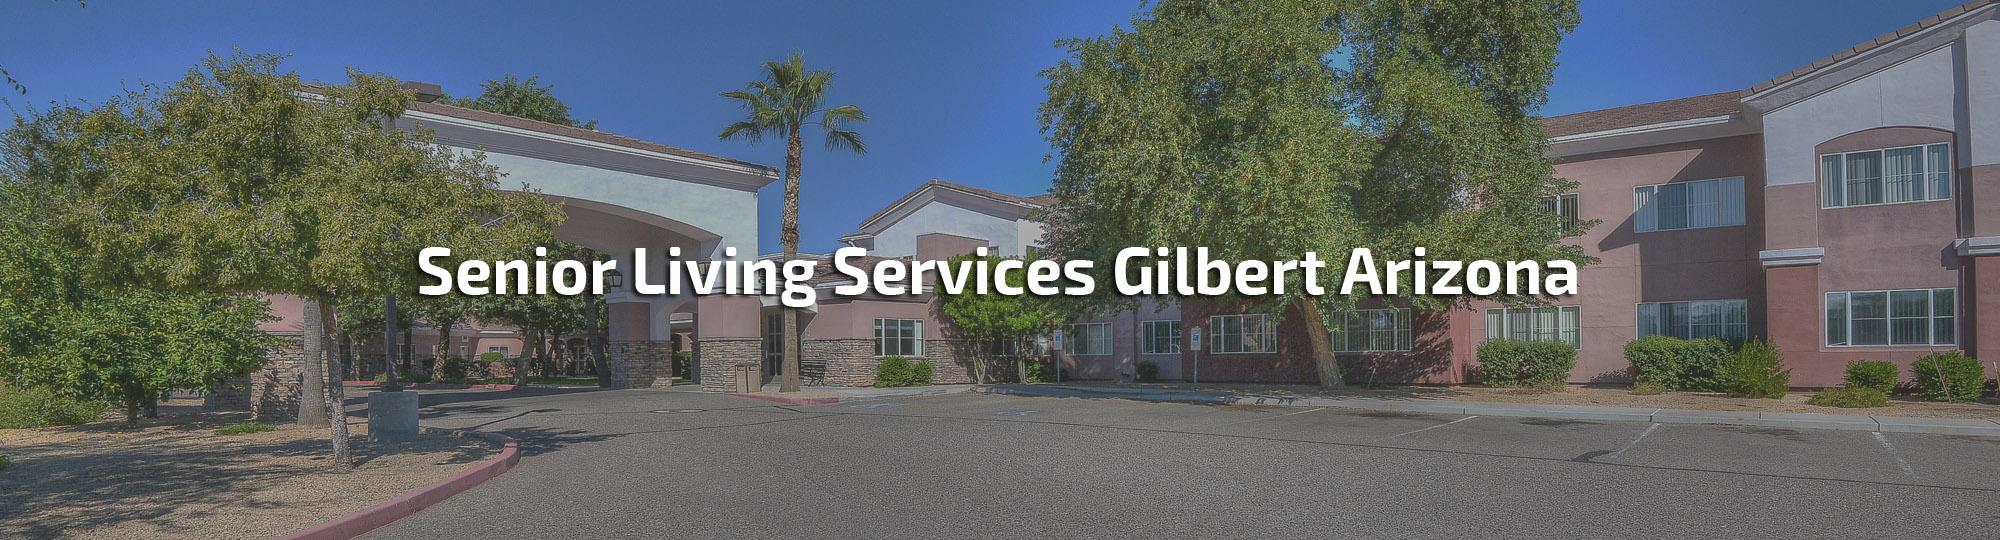 Senior Living Services Gilbert Arizona